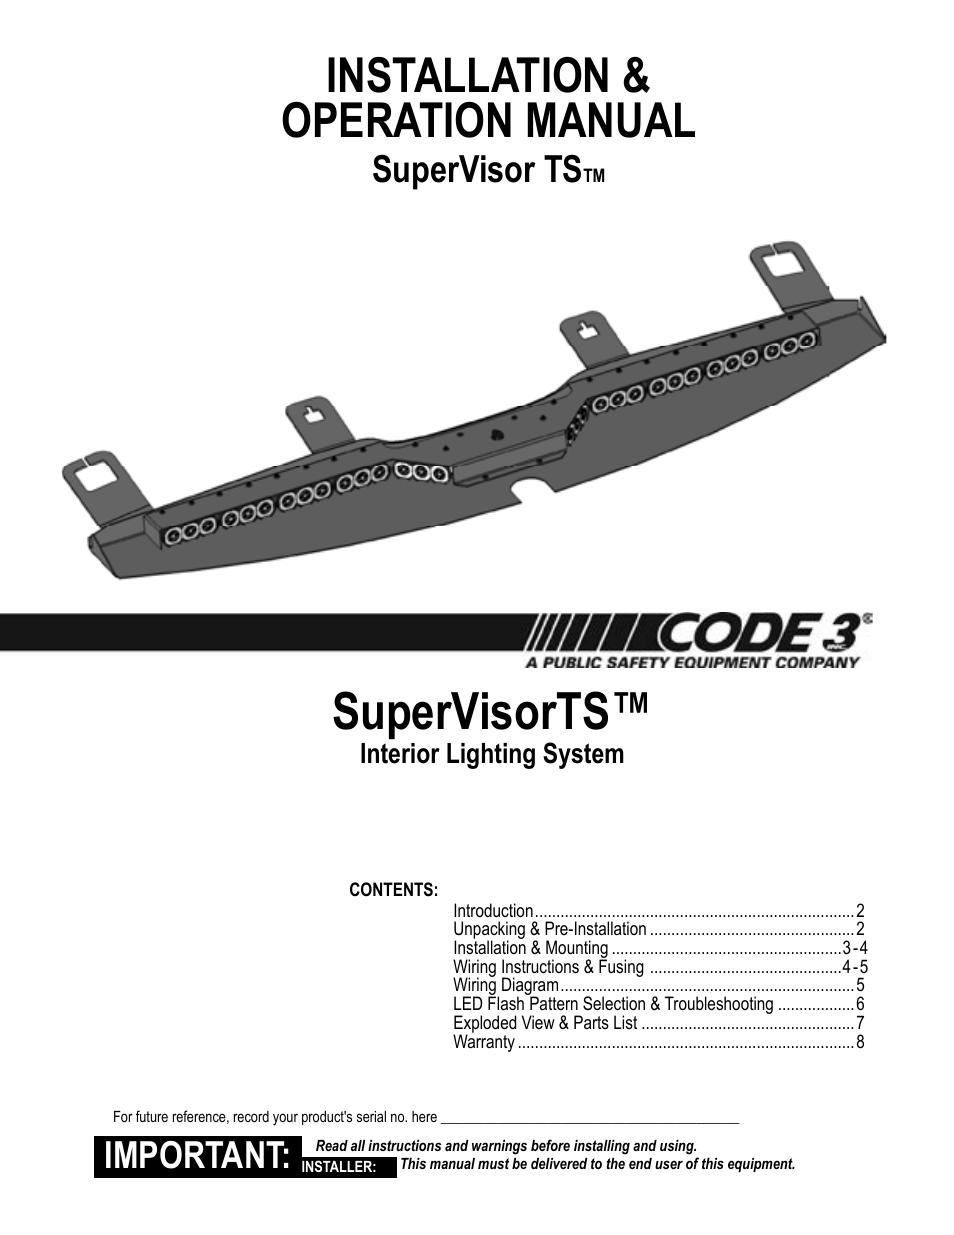 Code 3 Arrow Stick Wiring Diagram Trusted Diagrams Light Bar Lp6000 Portal U2022 Source